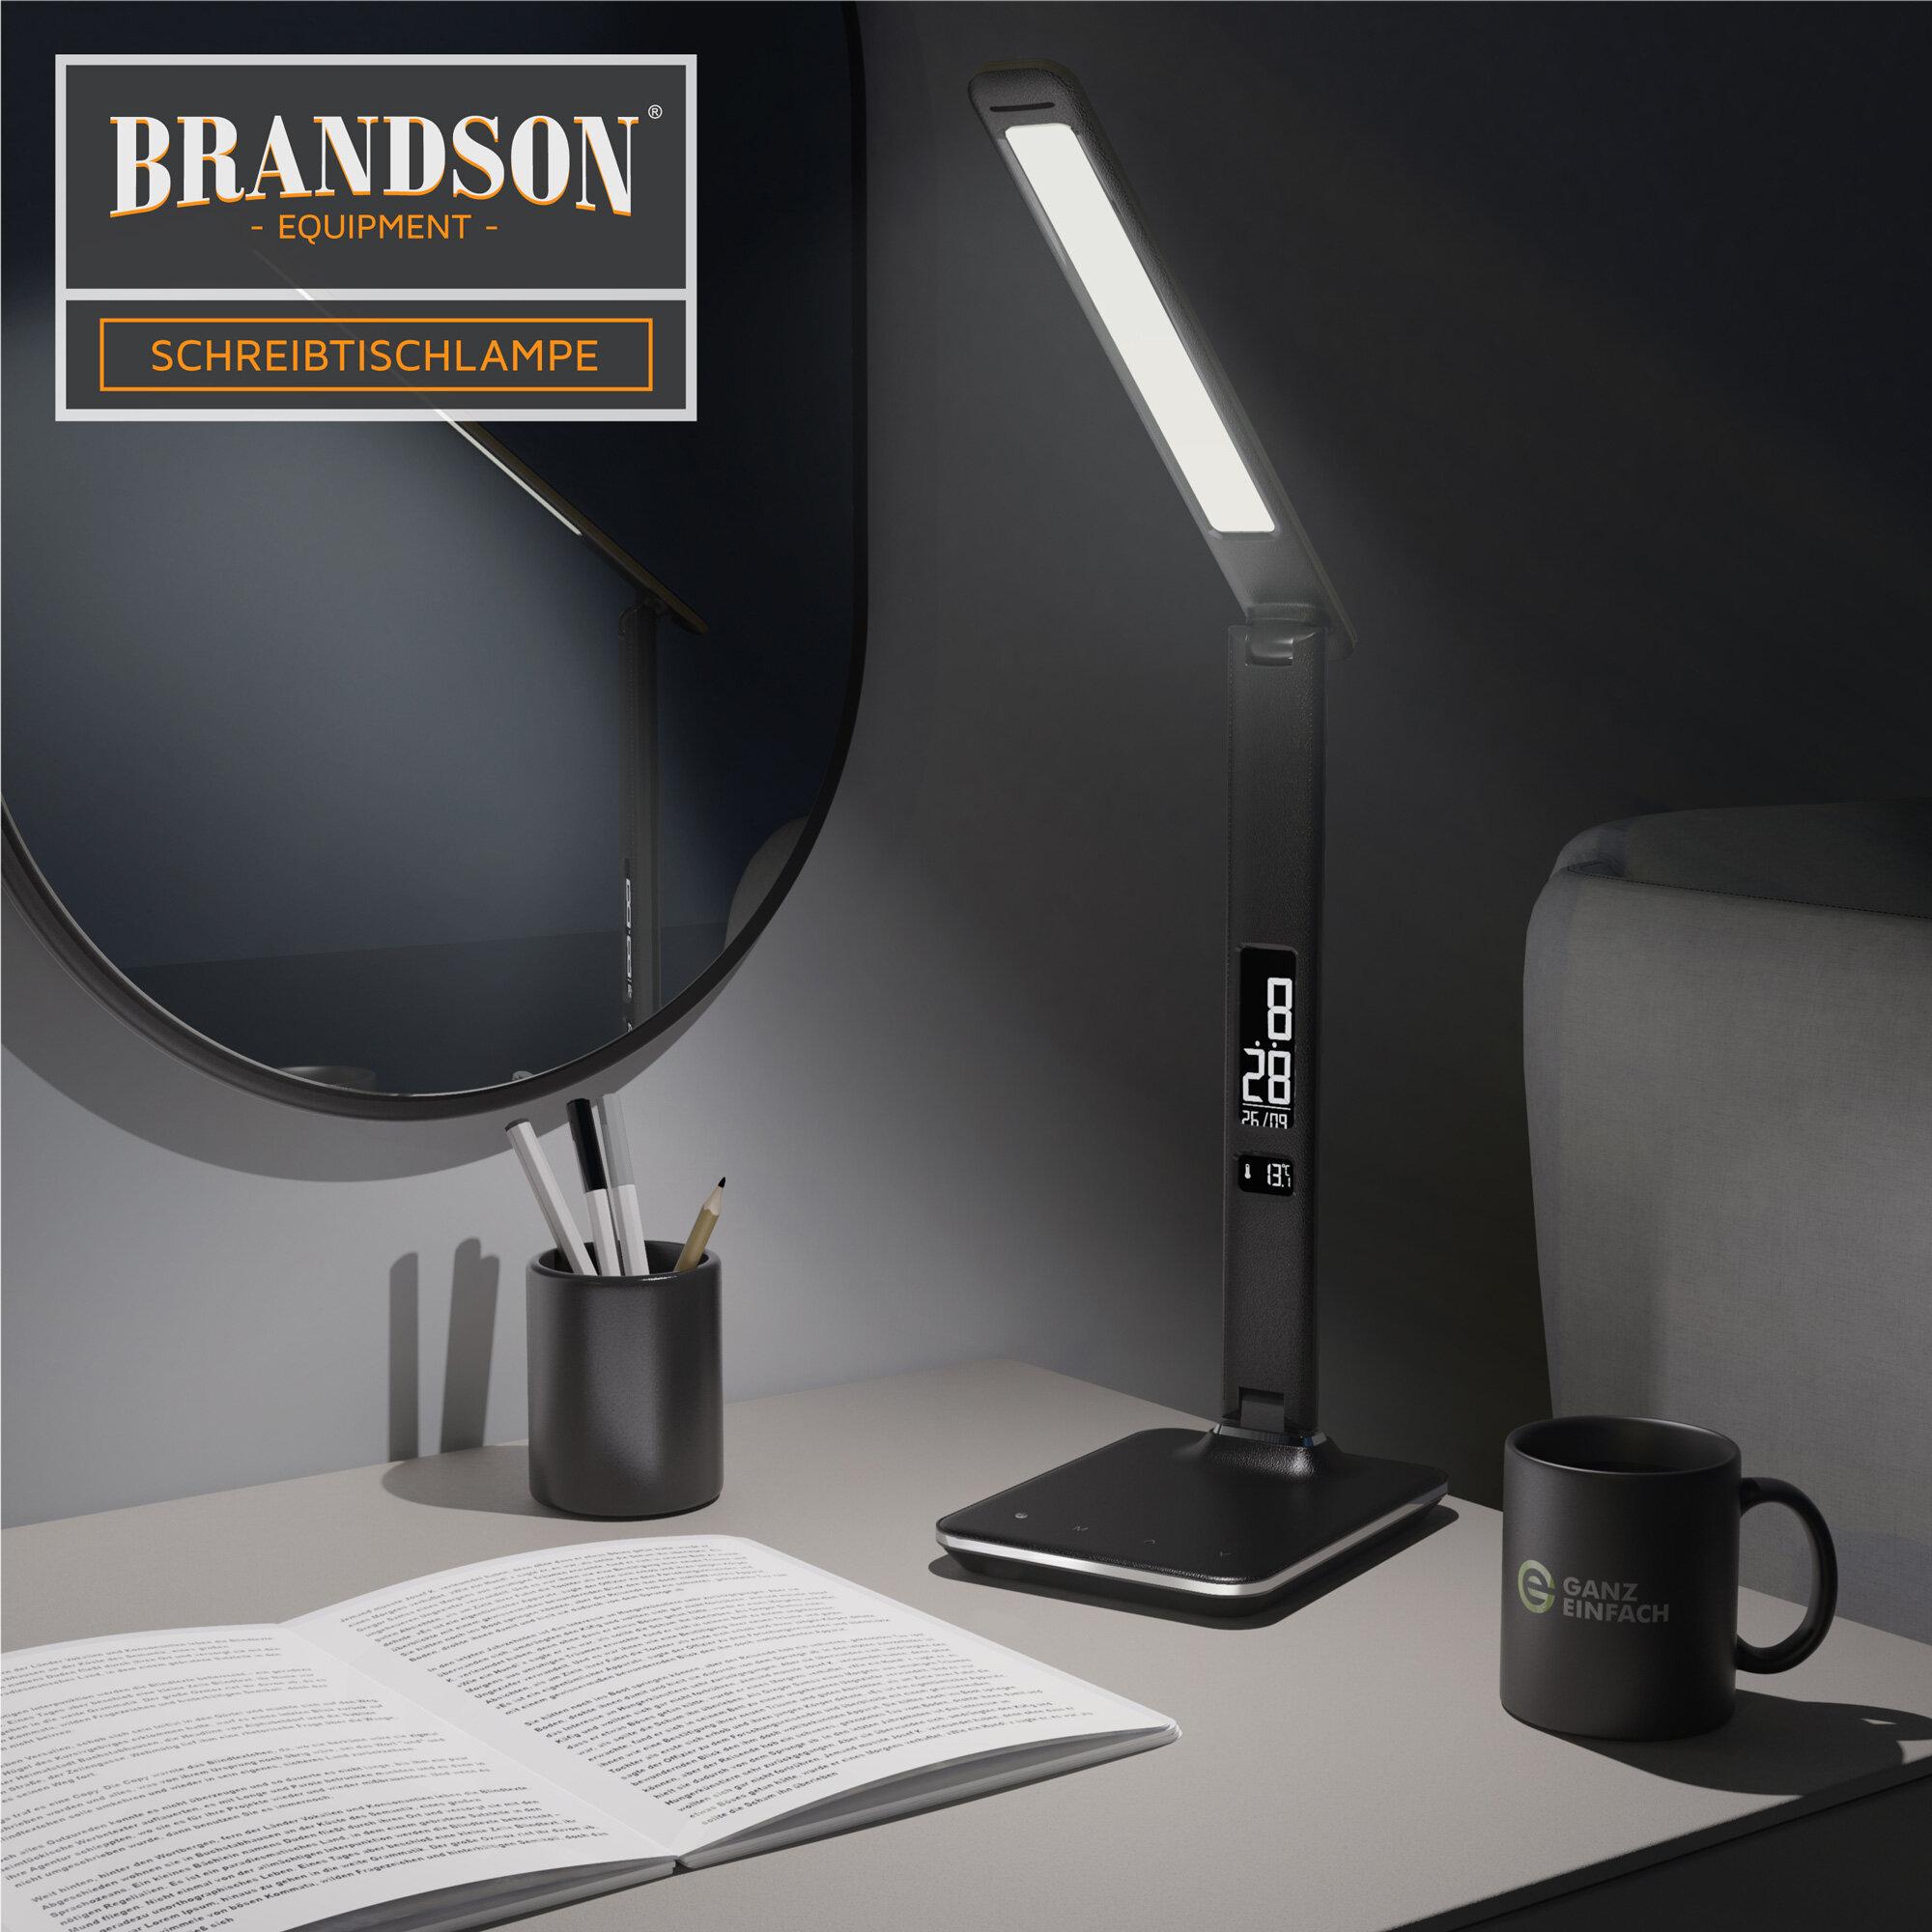 303579-LED-Schreibtischlampe-Lederoptik-anwendungsbild_2.jpg